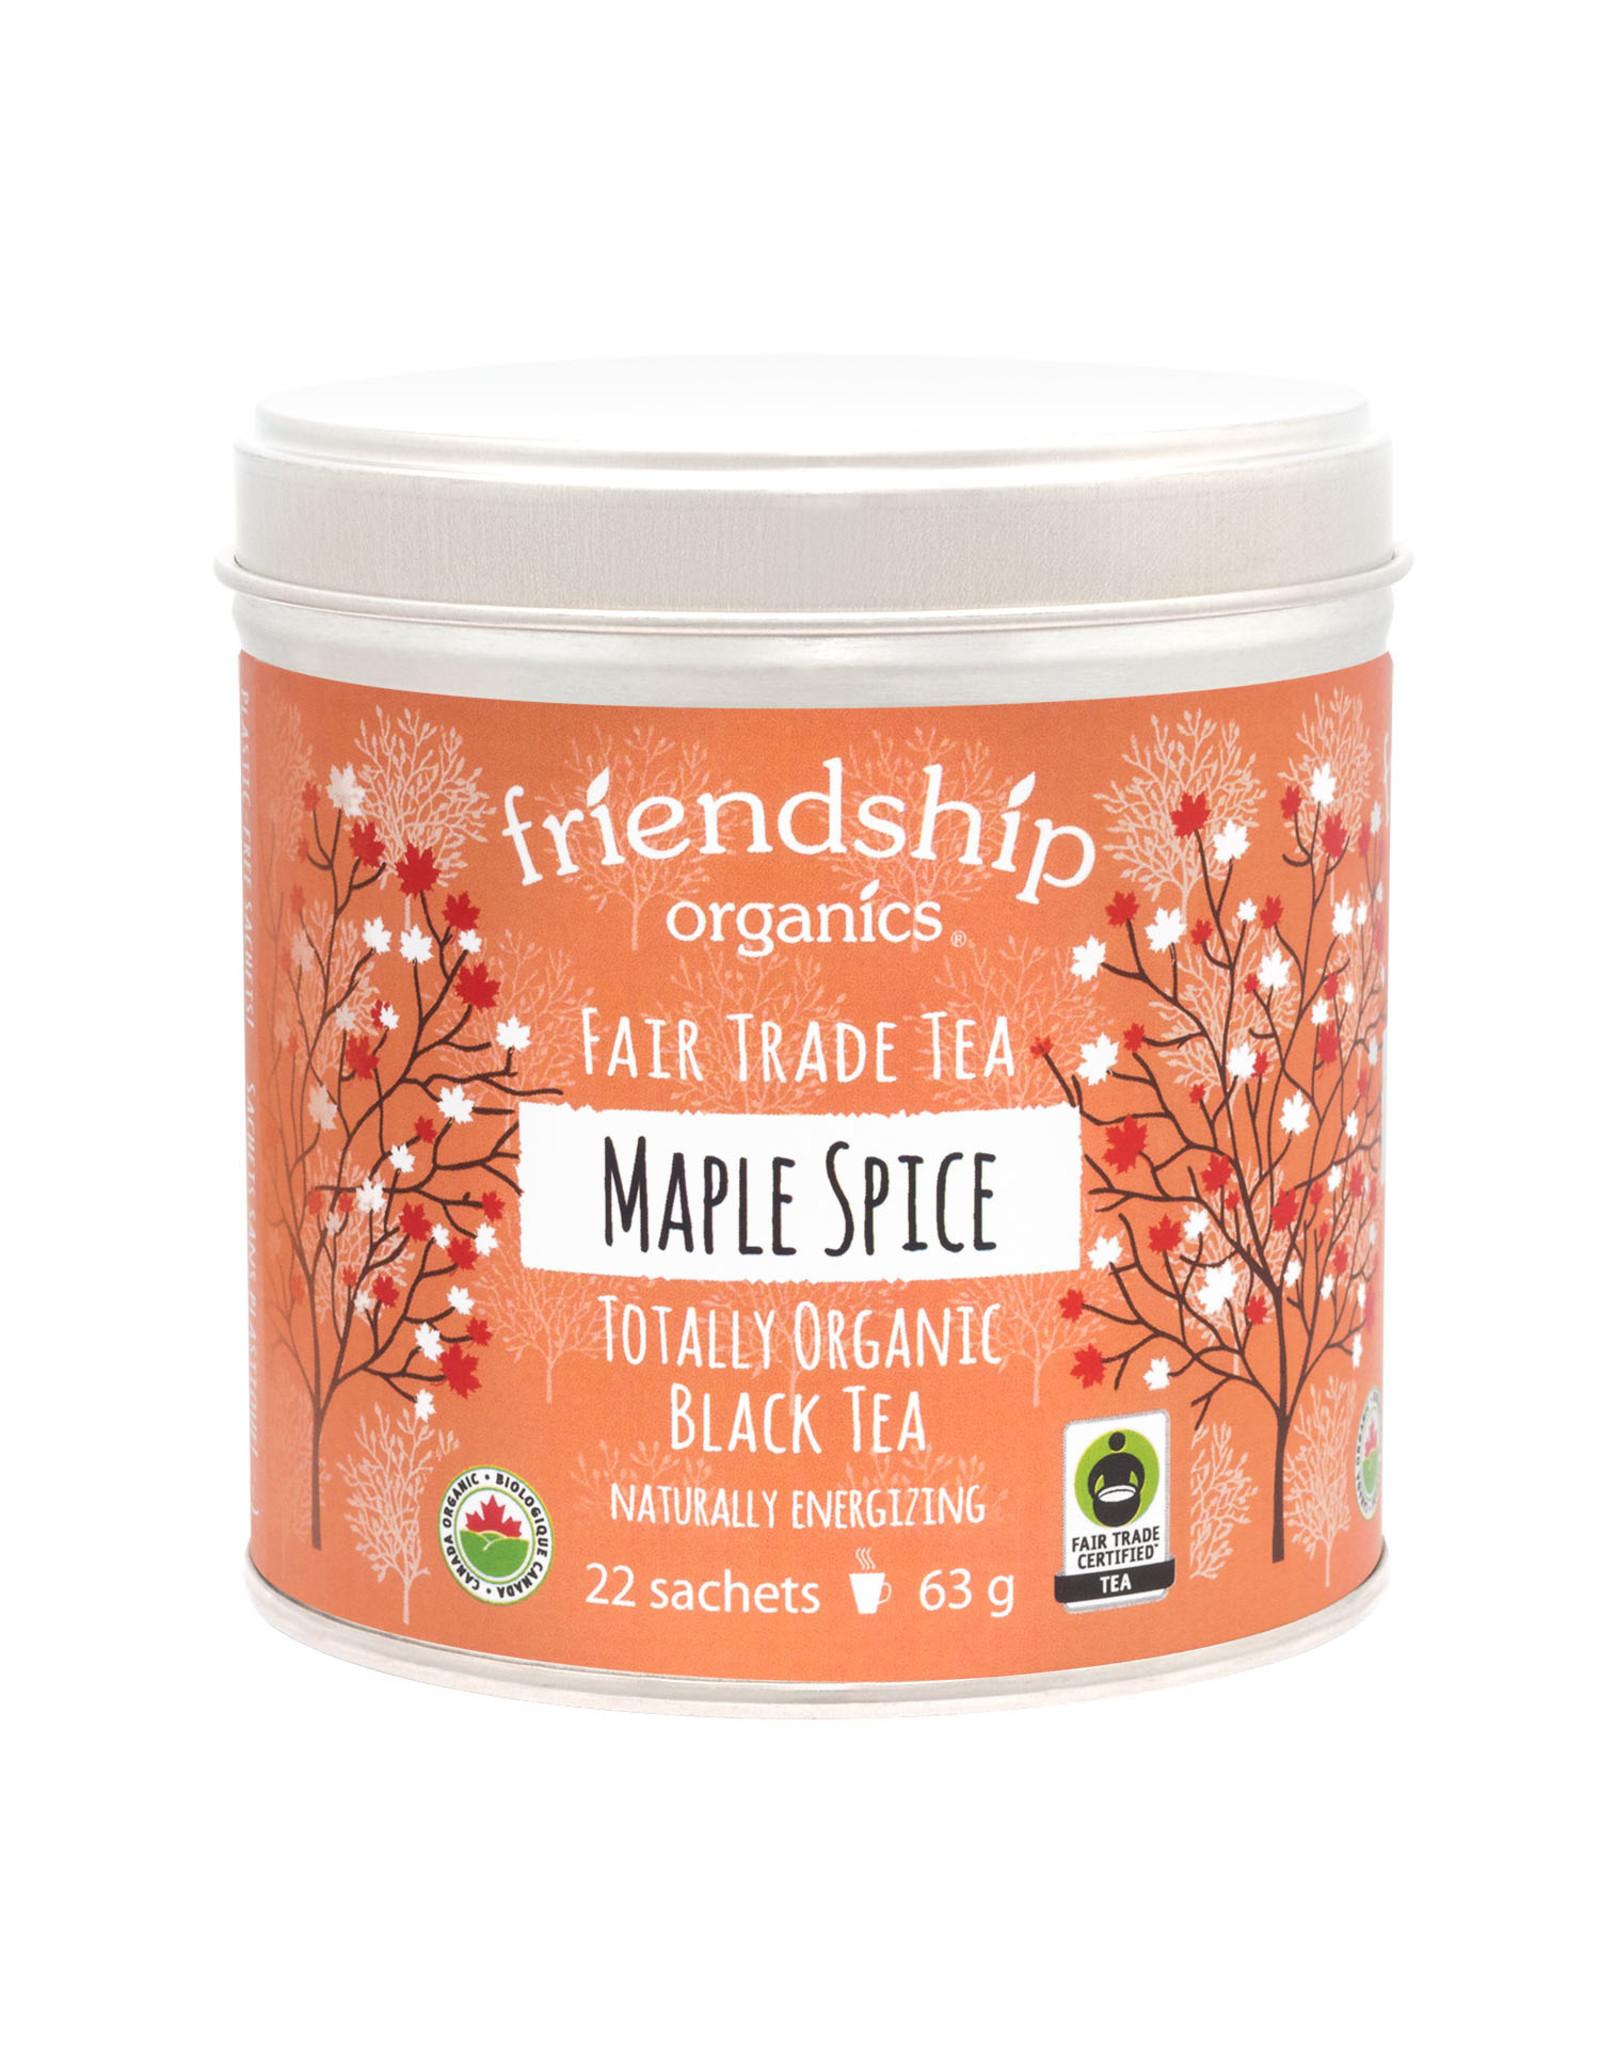 Friendship Organics Friendship Organics Maple Spice Black Tea Tin